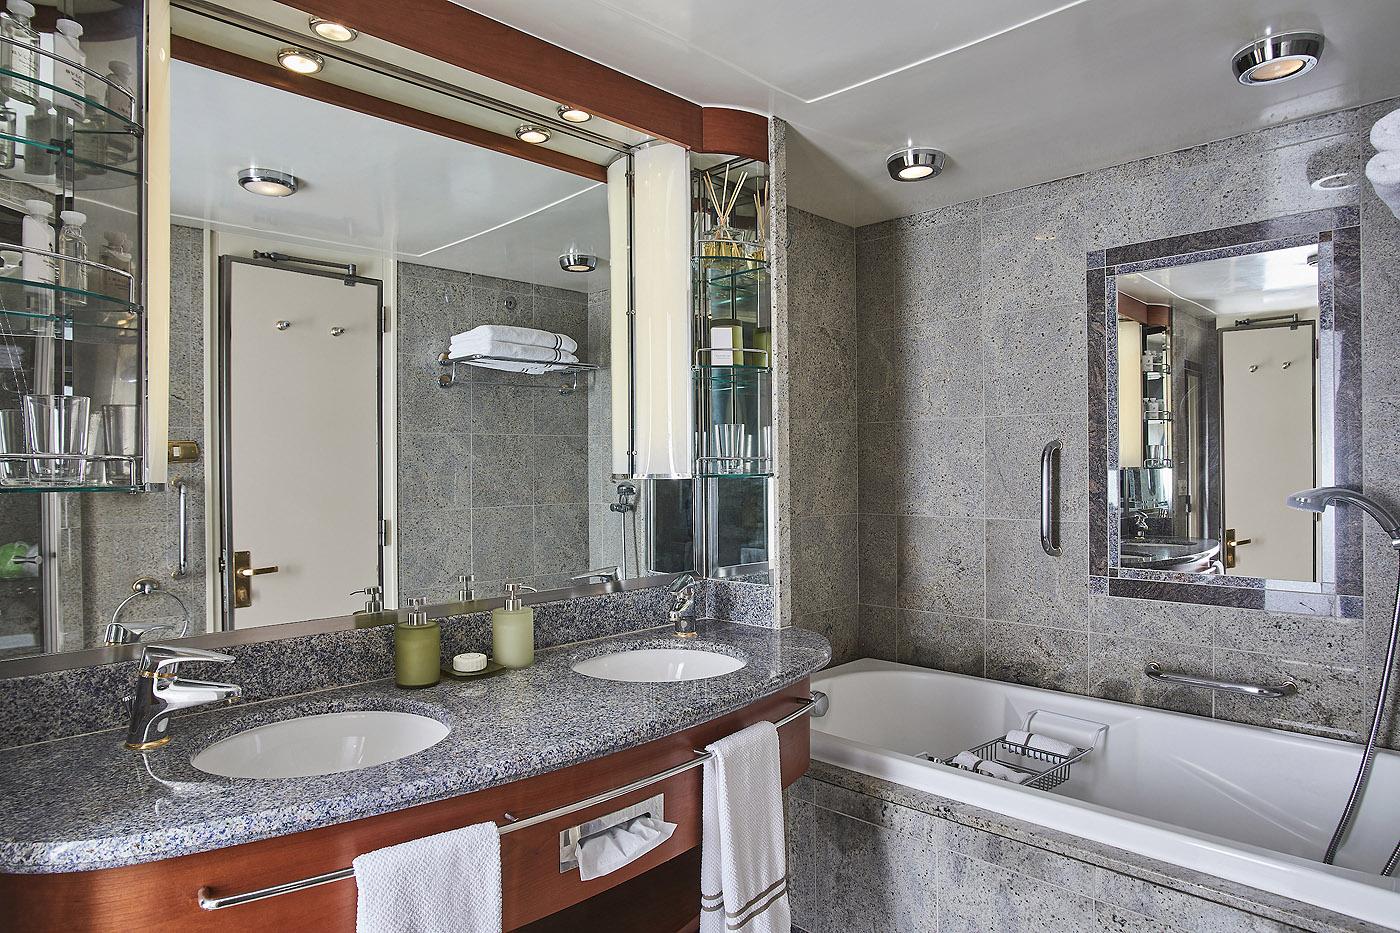 Grand Suite G1 / G2 2 Schlafzimmer - Silver Whisper - Bild 4 - Thumb